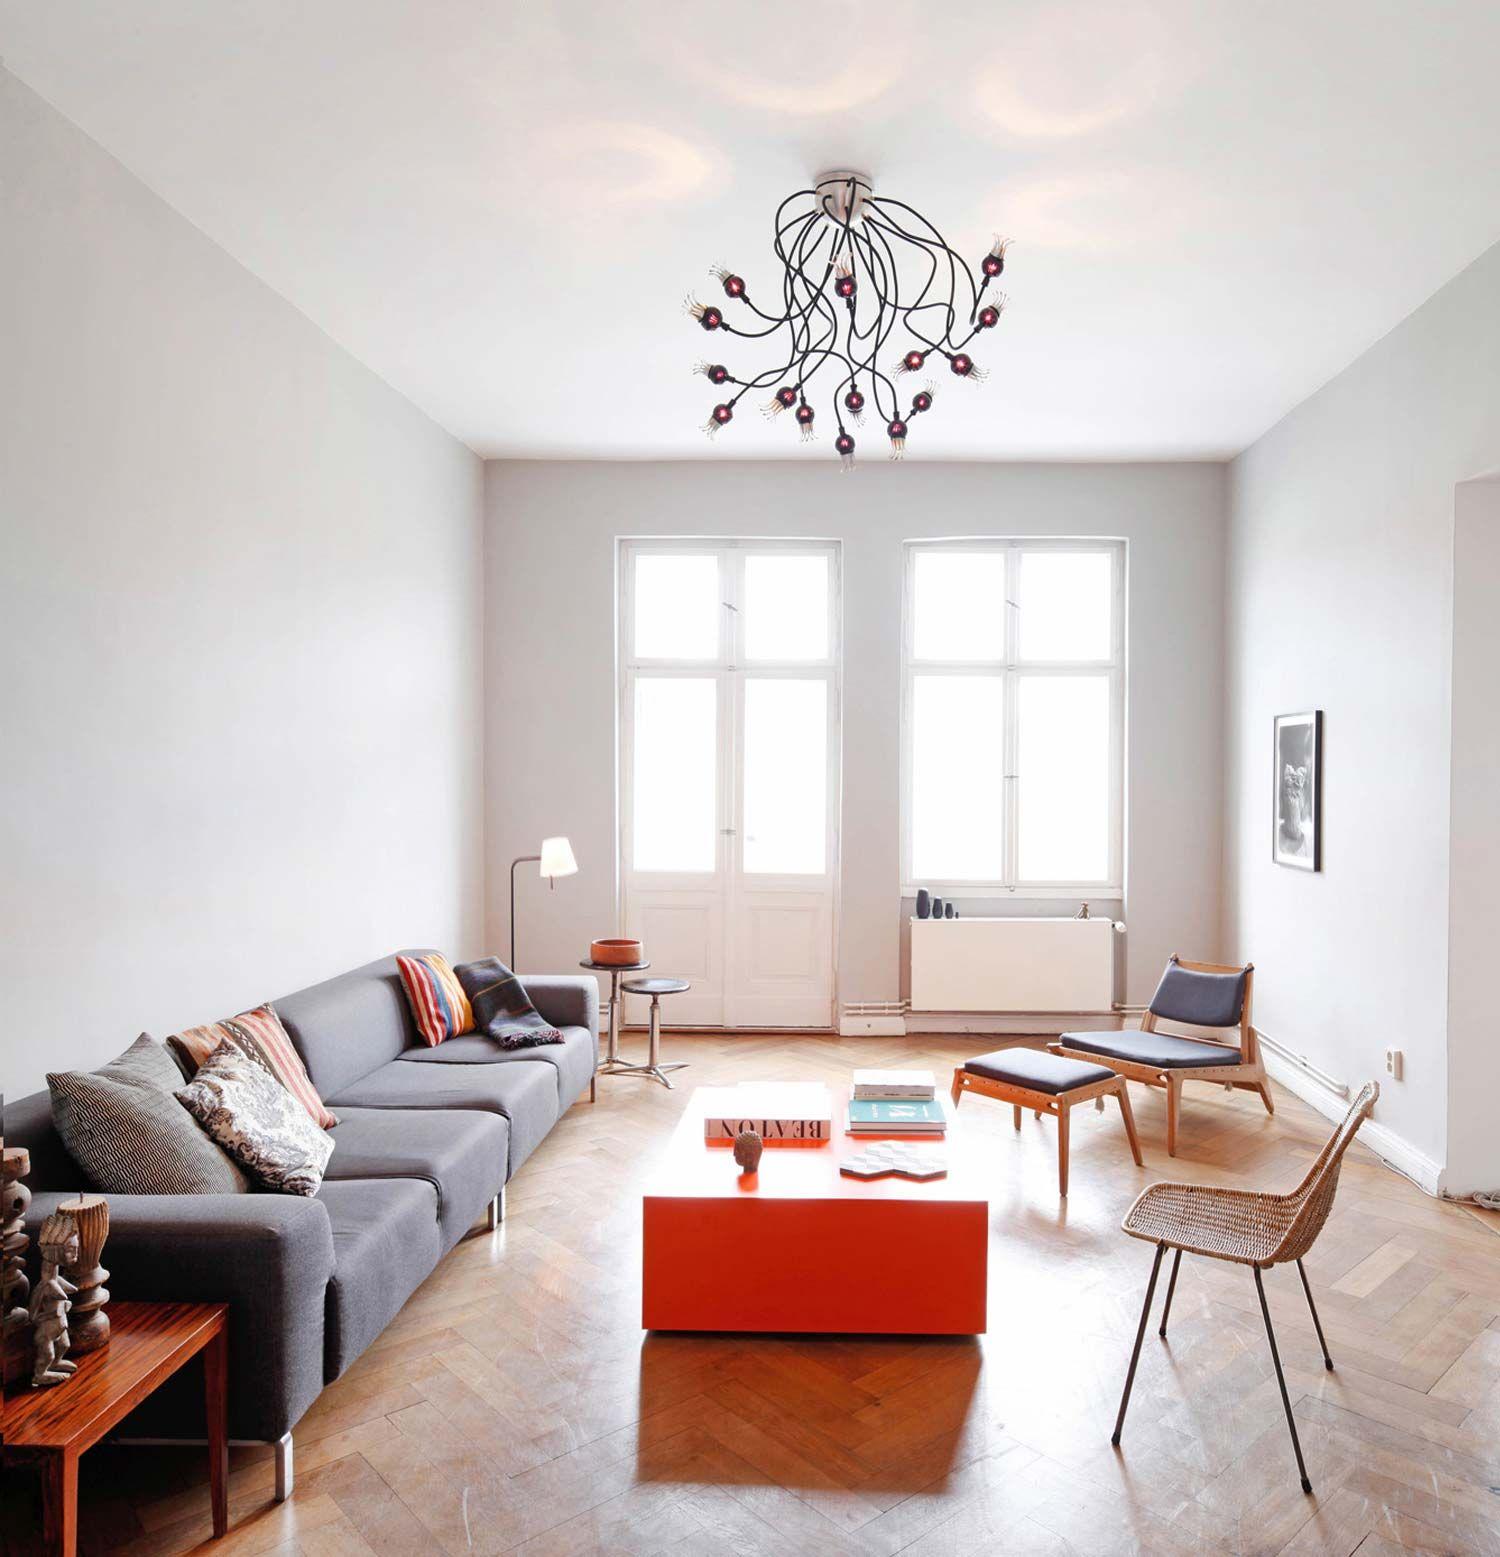 Lighting Poppy Ceiling Innenarchitektur Architektur Serien